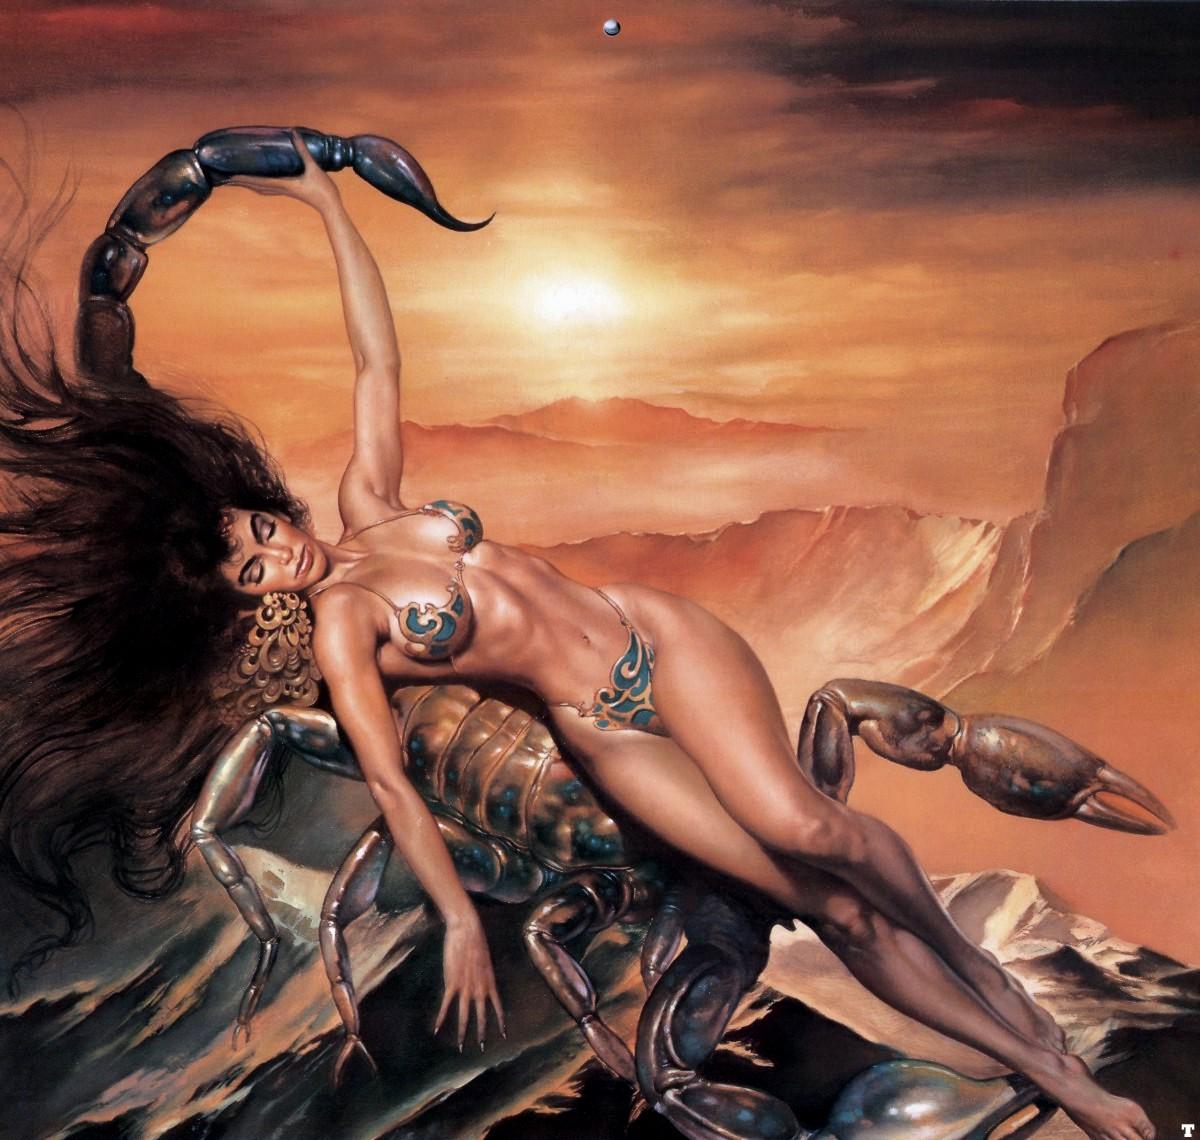 chem-horosh-skorpion-v-sekse